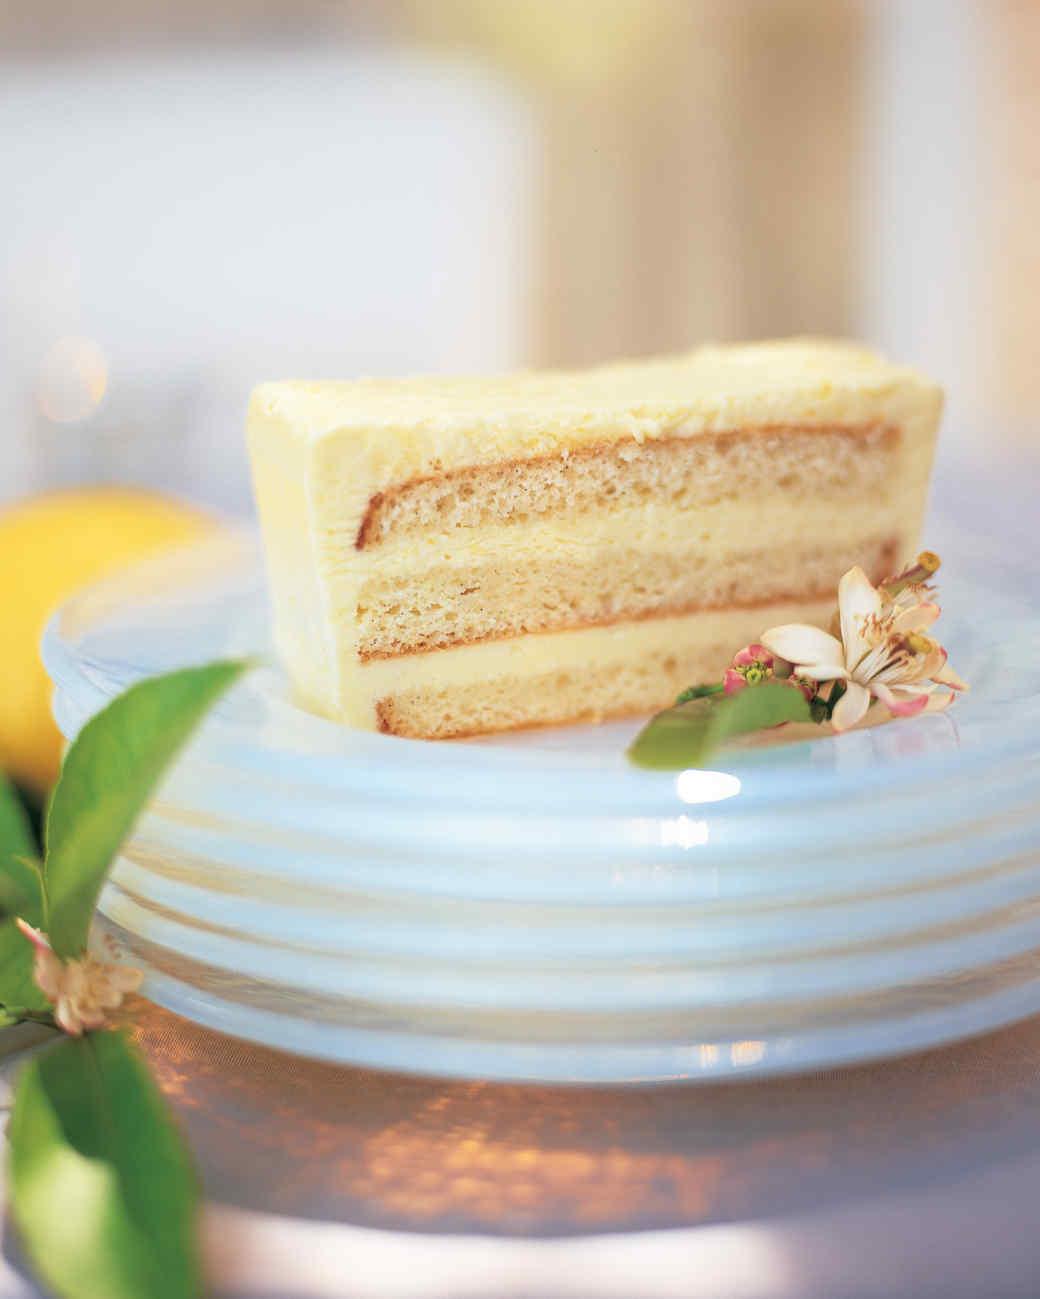 semifreddo-cake-0502-mla98851.jpg